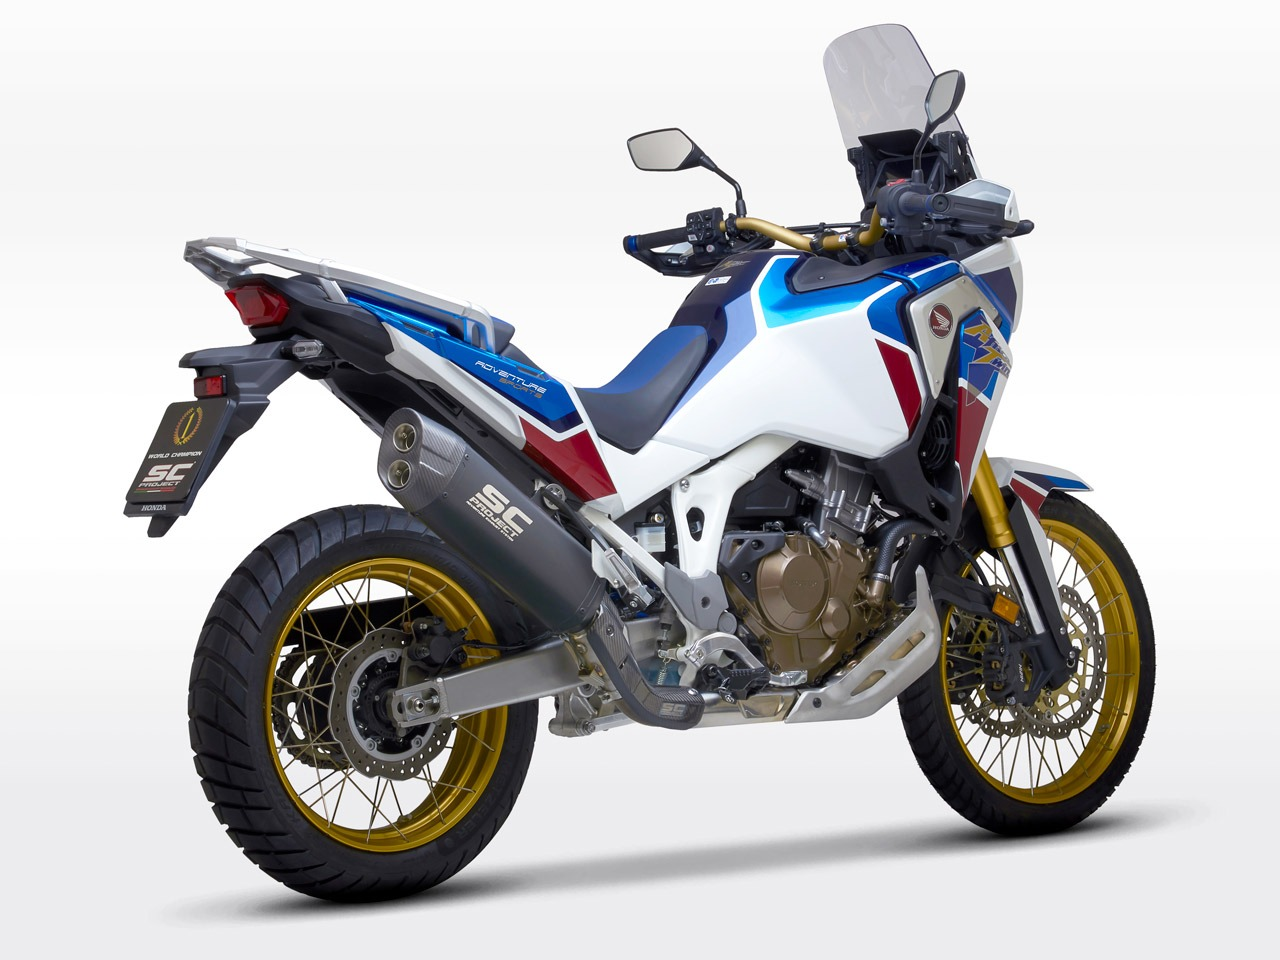 Honda_CRF1100L-AfricaTwin_my2021_Adventure-MattBlack_3-4Posteriore_1280x960px_web-partnership